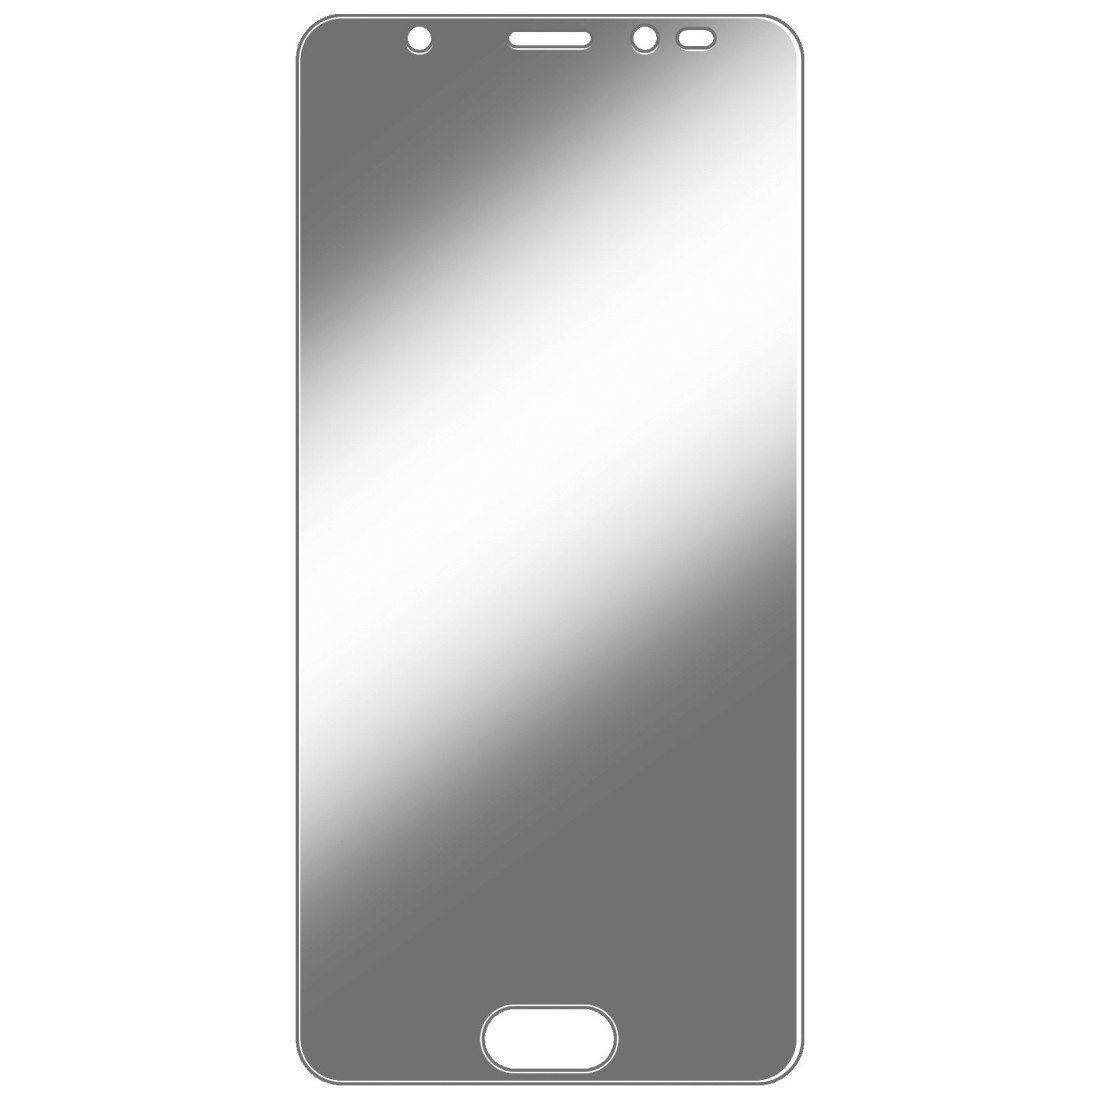 Hama Display-Schutzfolie Crystal Clear für Wiko U Feel Prime, 2